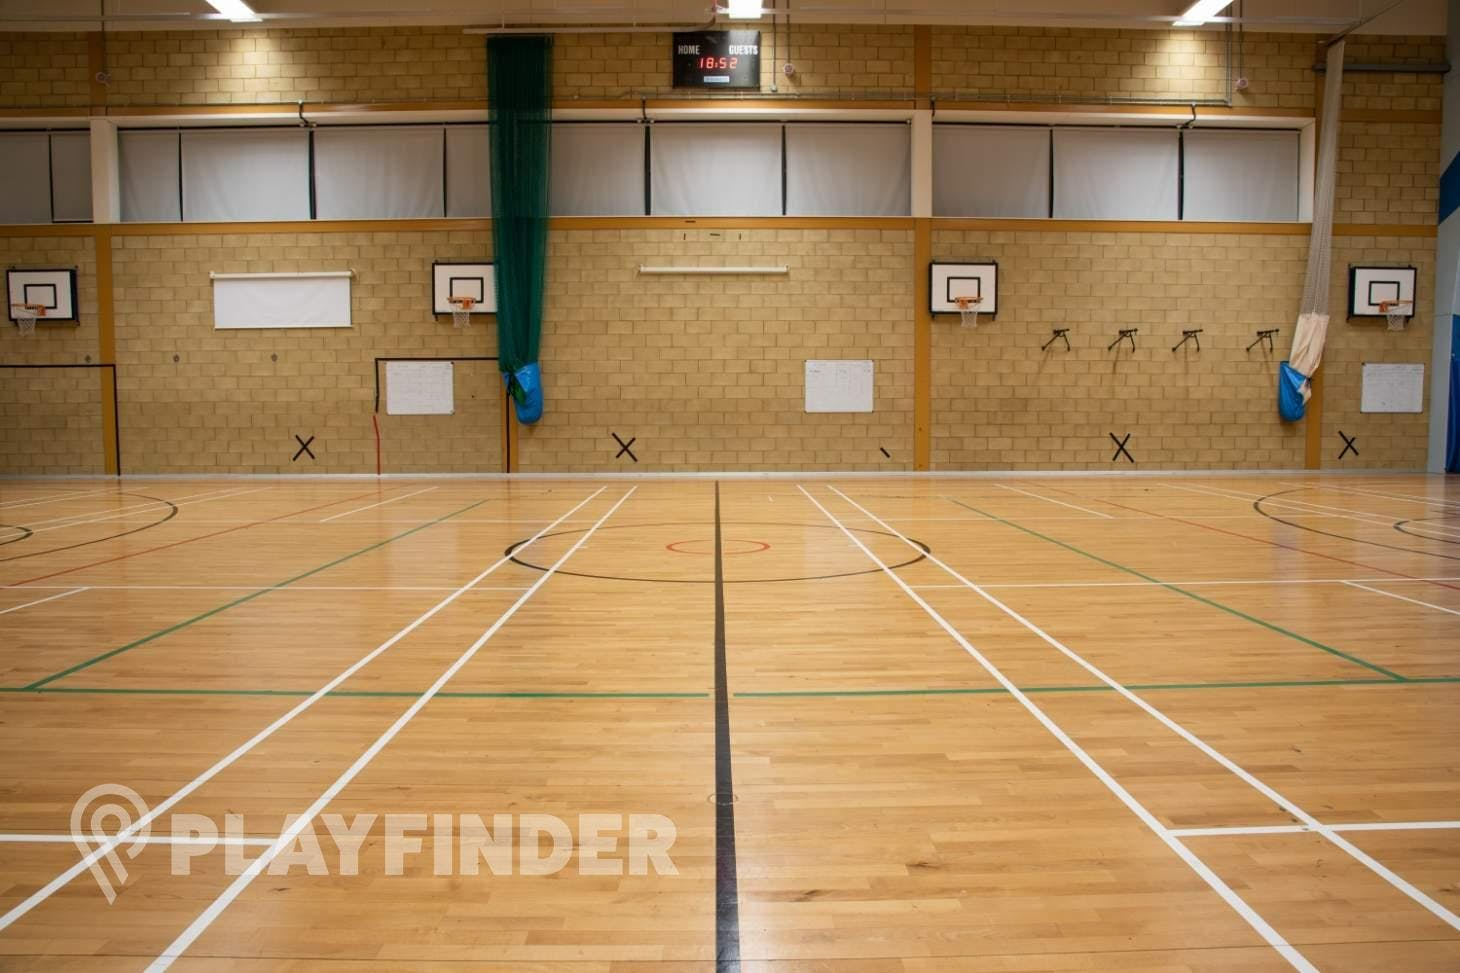 The Petchey Academy Sports Club Indoor badminton court